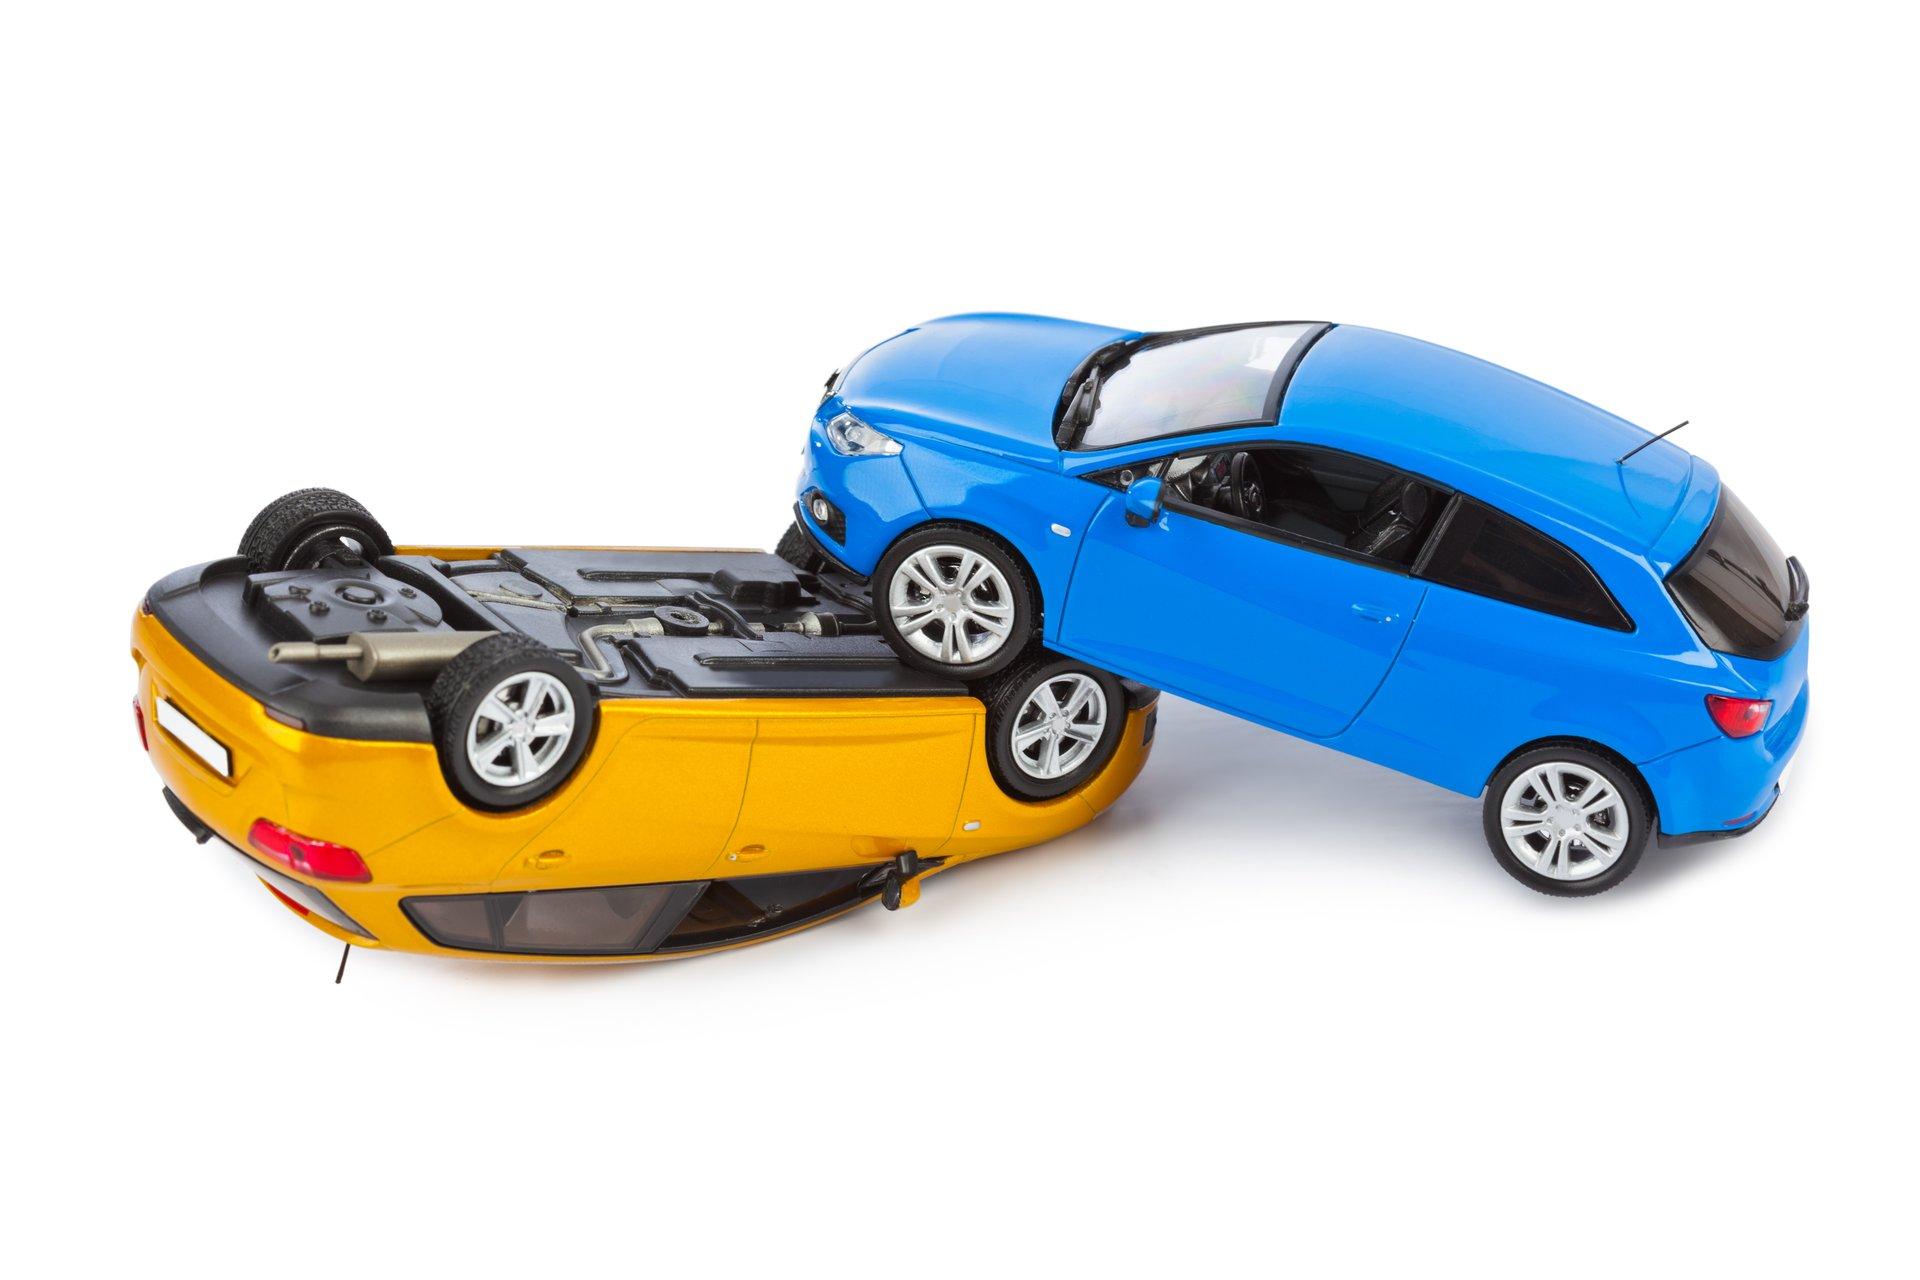 Toy Car Wreck